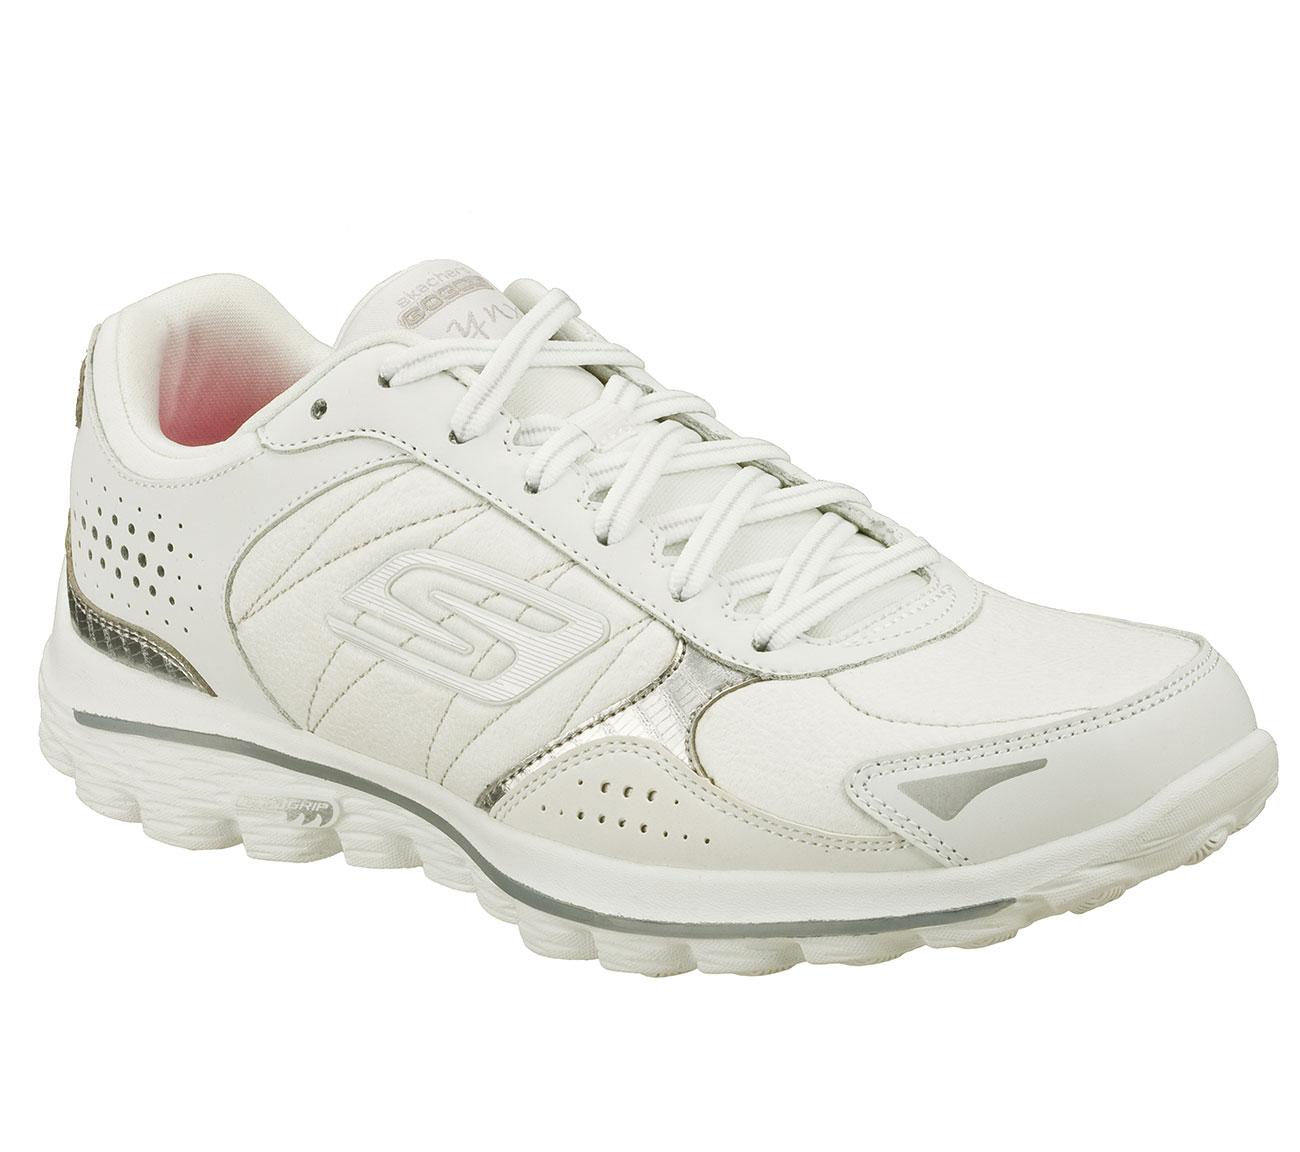 Lynx Golf Shoes